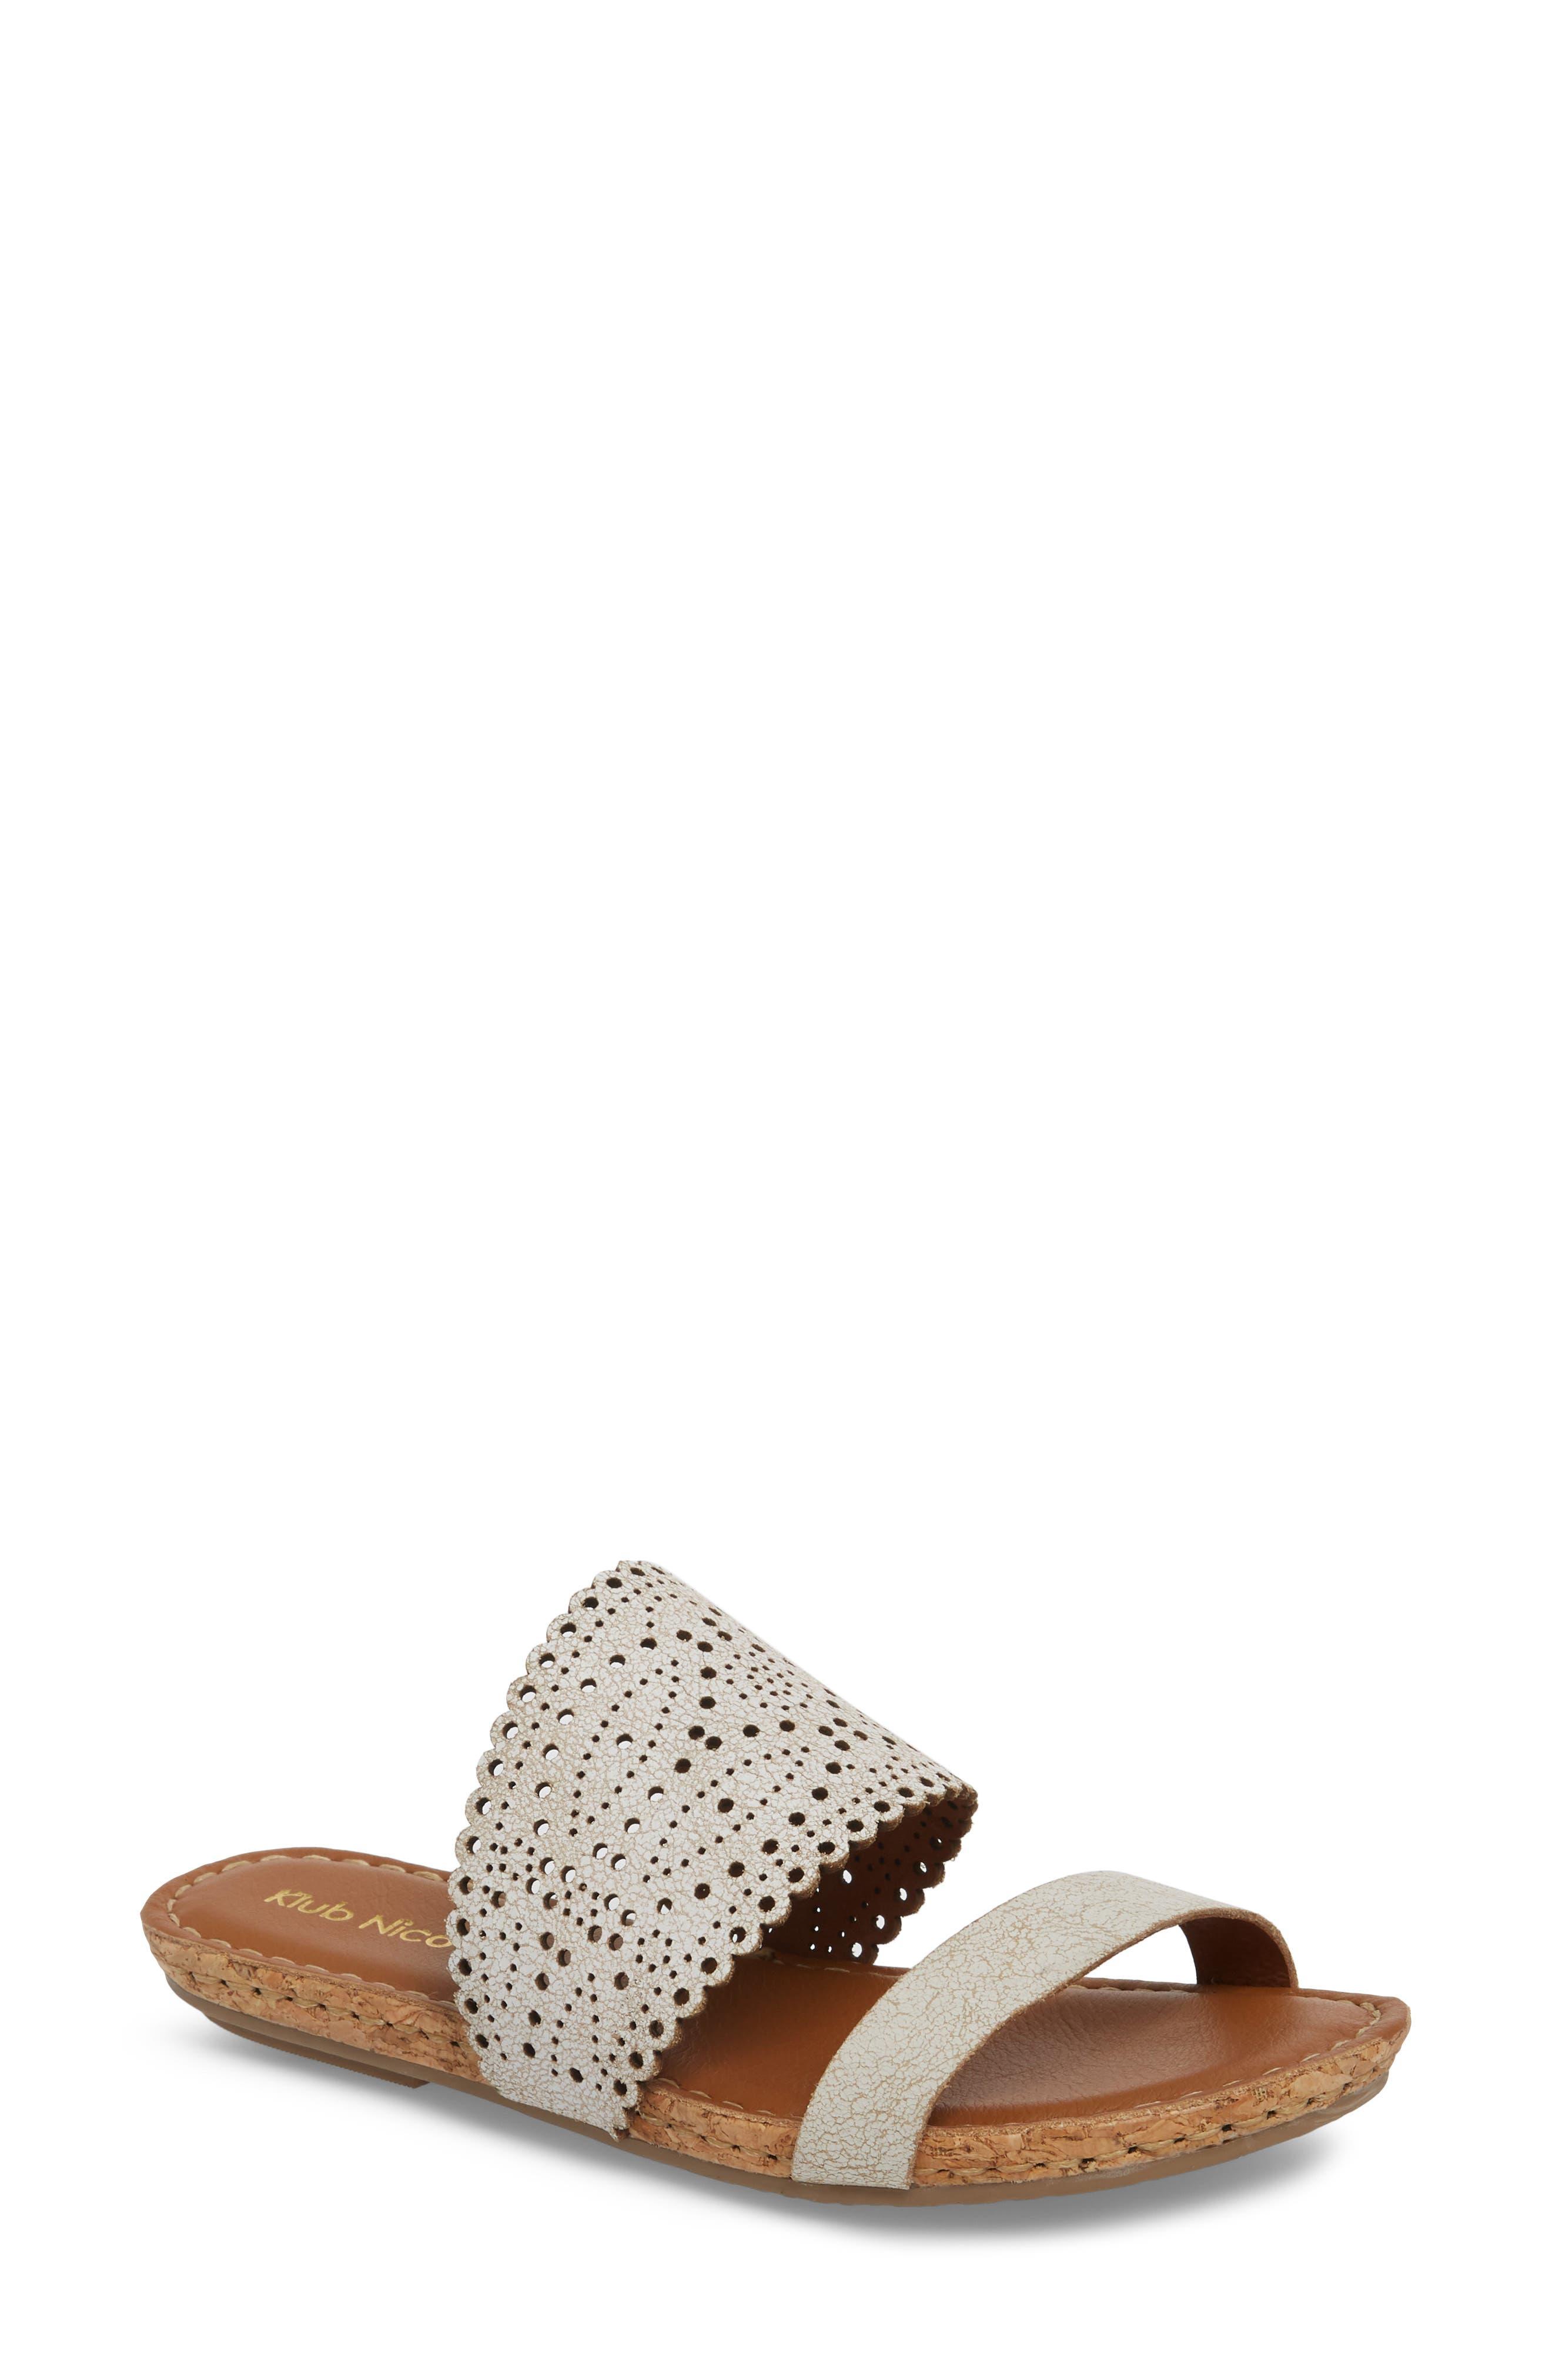 KLUB NICO, Ginette Perforated Slide Sandal, Main thumbnail 1, color, WHITE LEATHER